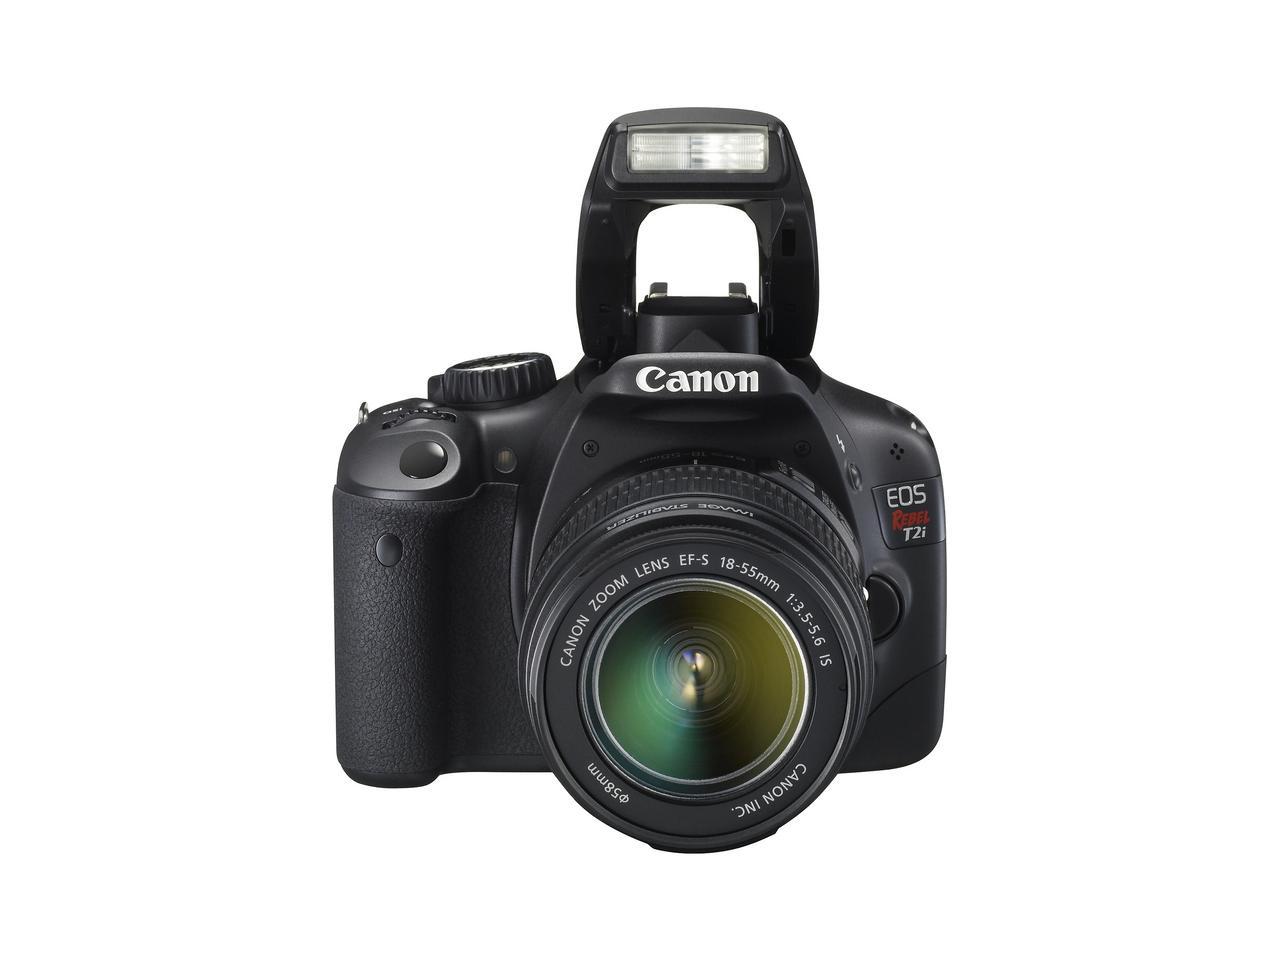 EOS Rebel T2i Digital SLR camera - Flash Open